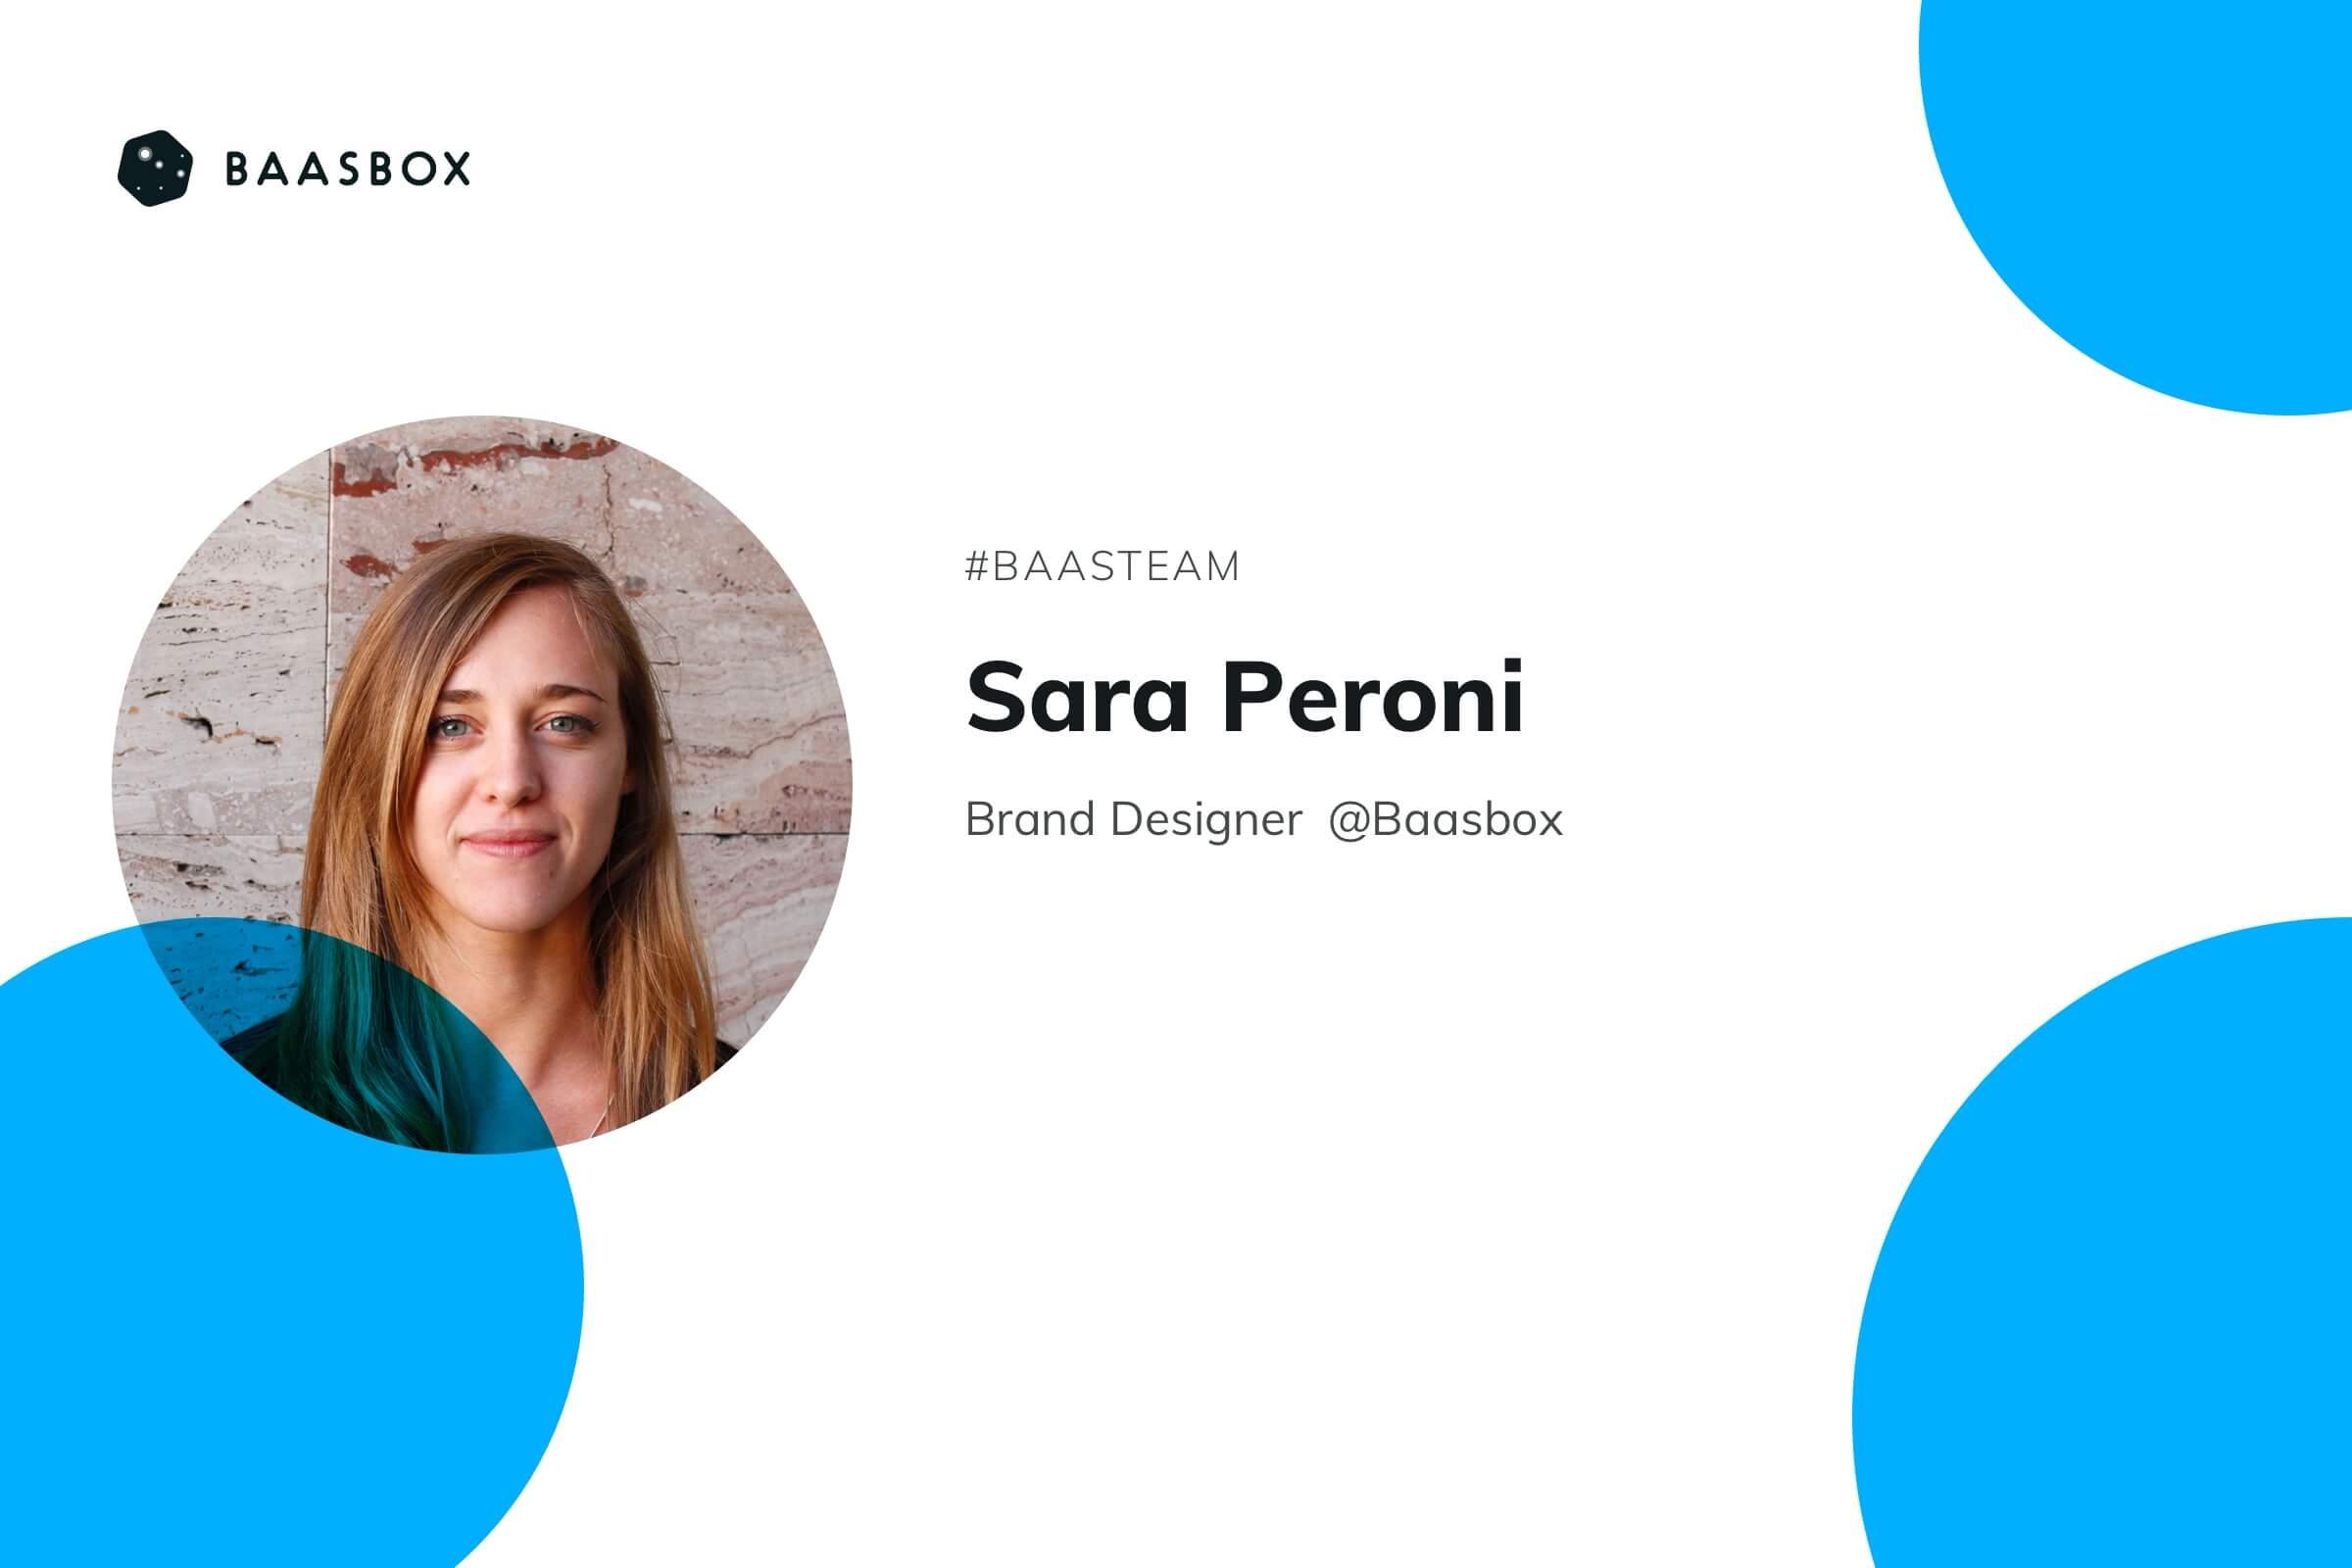 Sara Peroni